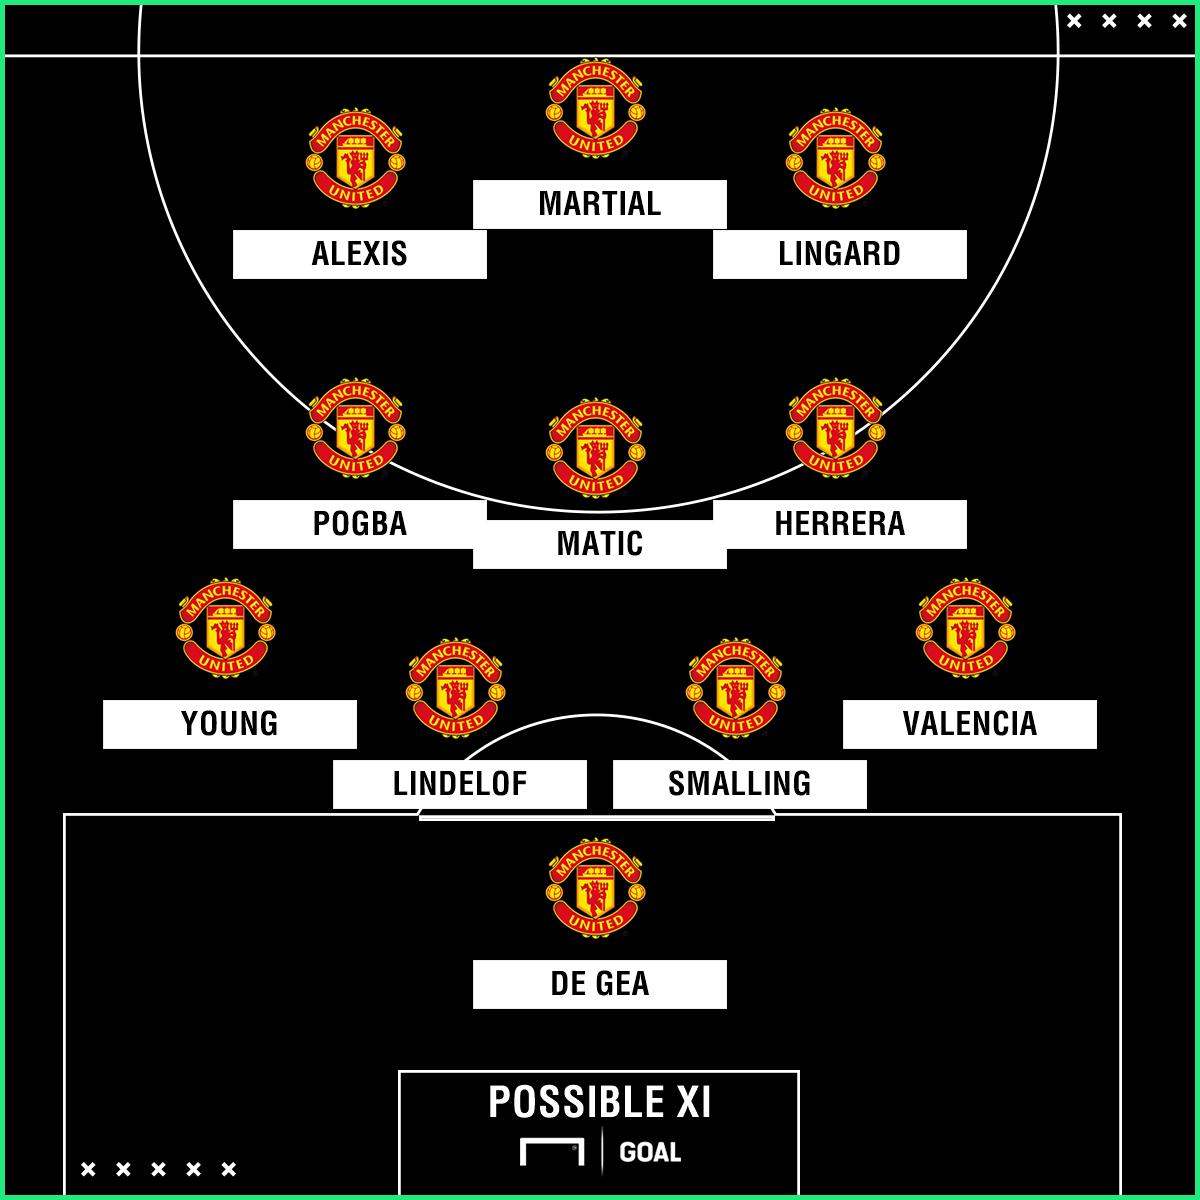 Possible Man Utd XI vs West Ham